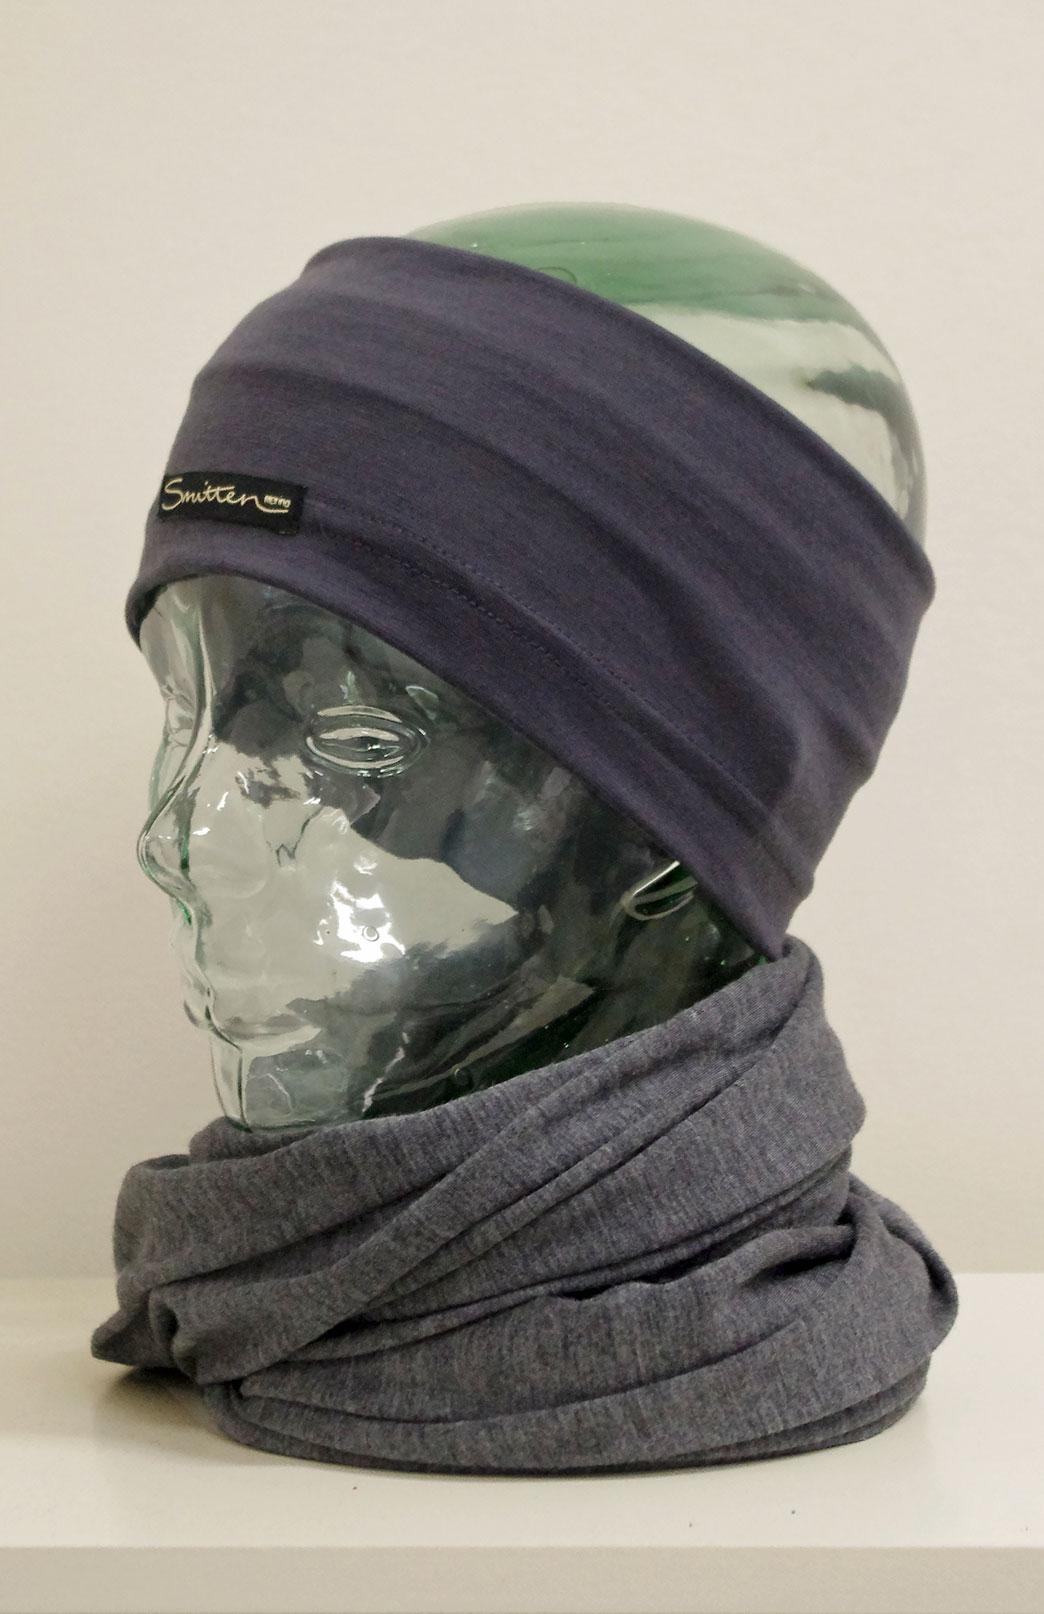 Headband / Ear Warmer - Unisex Steel Grey Stripe Merino Wool Headband and Ear Warmer - Smitten Merino Tasmania Australia